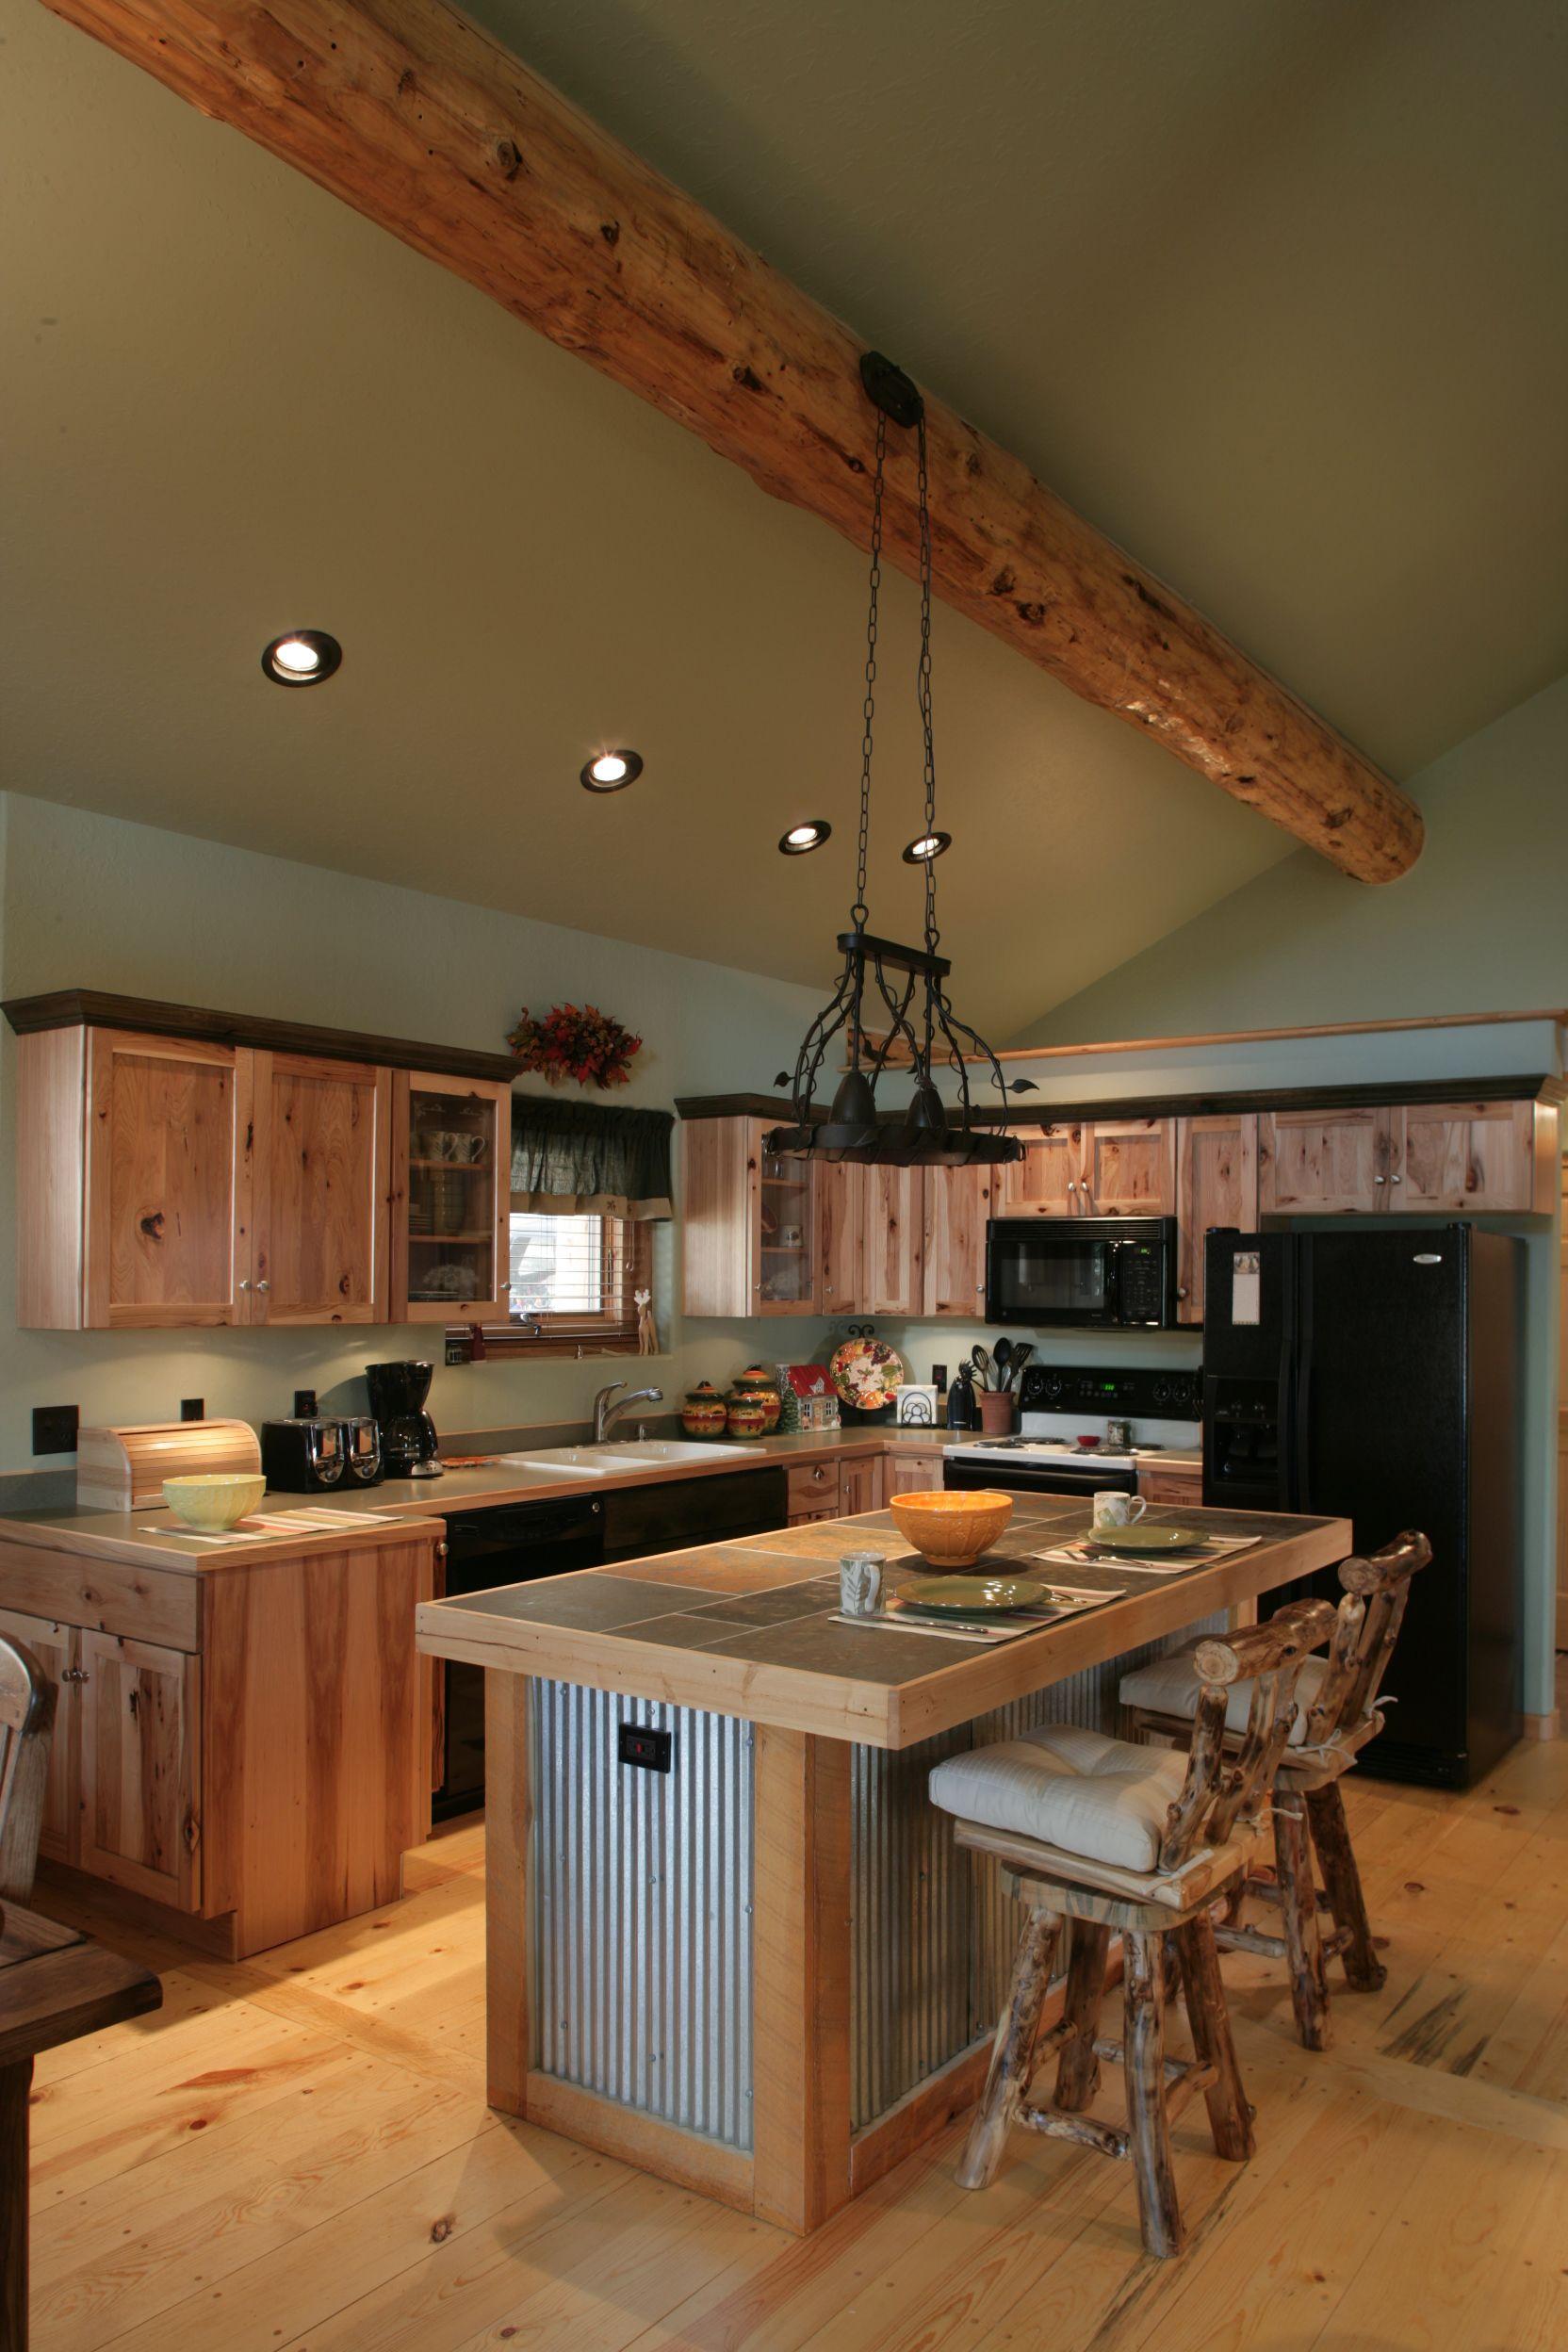 Log Cabin Kitchen With Corrugated Metal Island Furniture